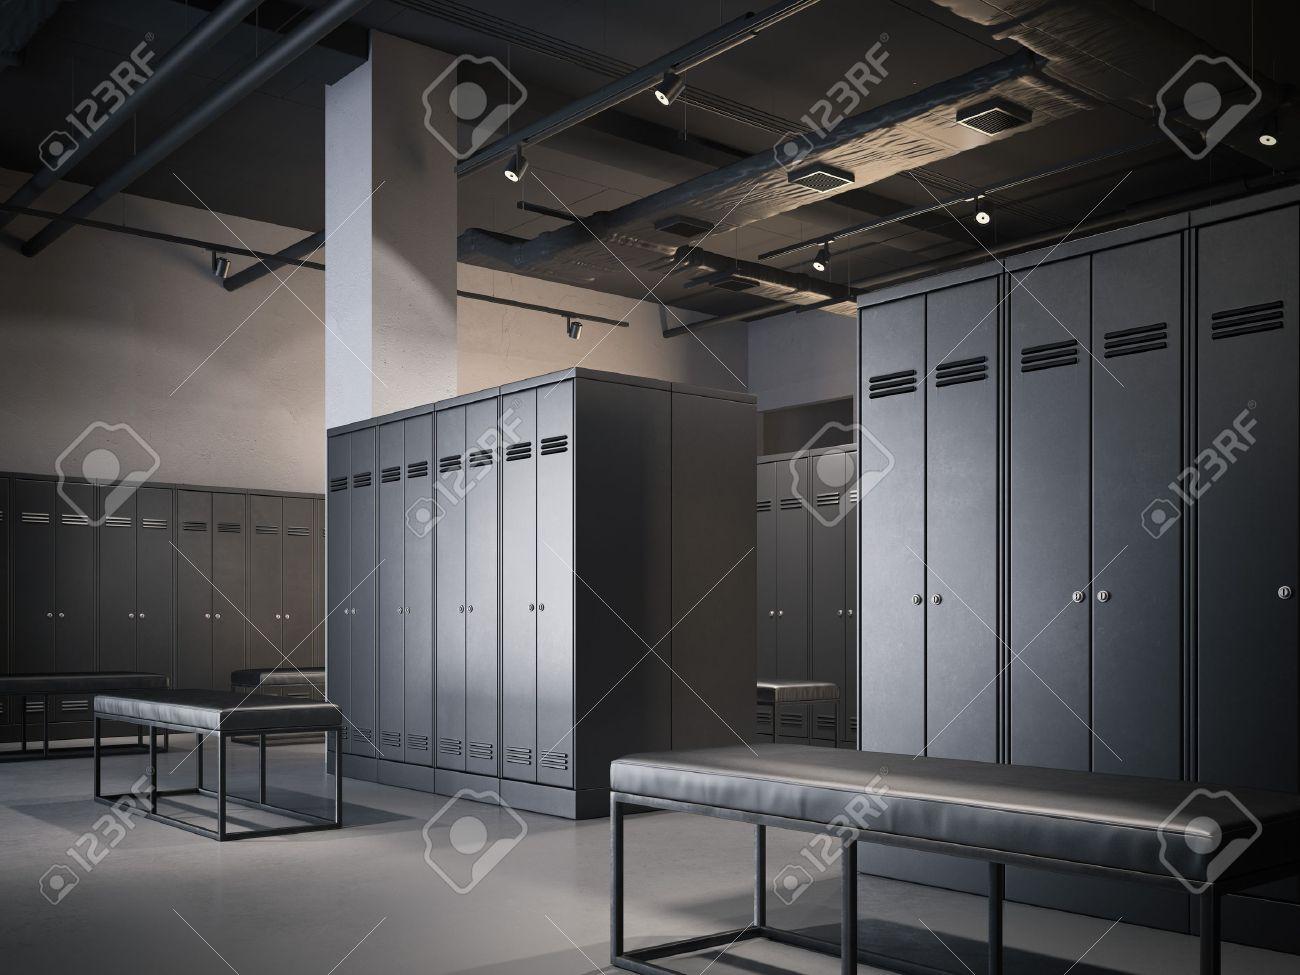 Modern locker room in loft interior with black cabinets. 3d rendering - 68193057